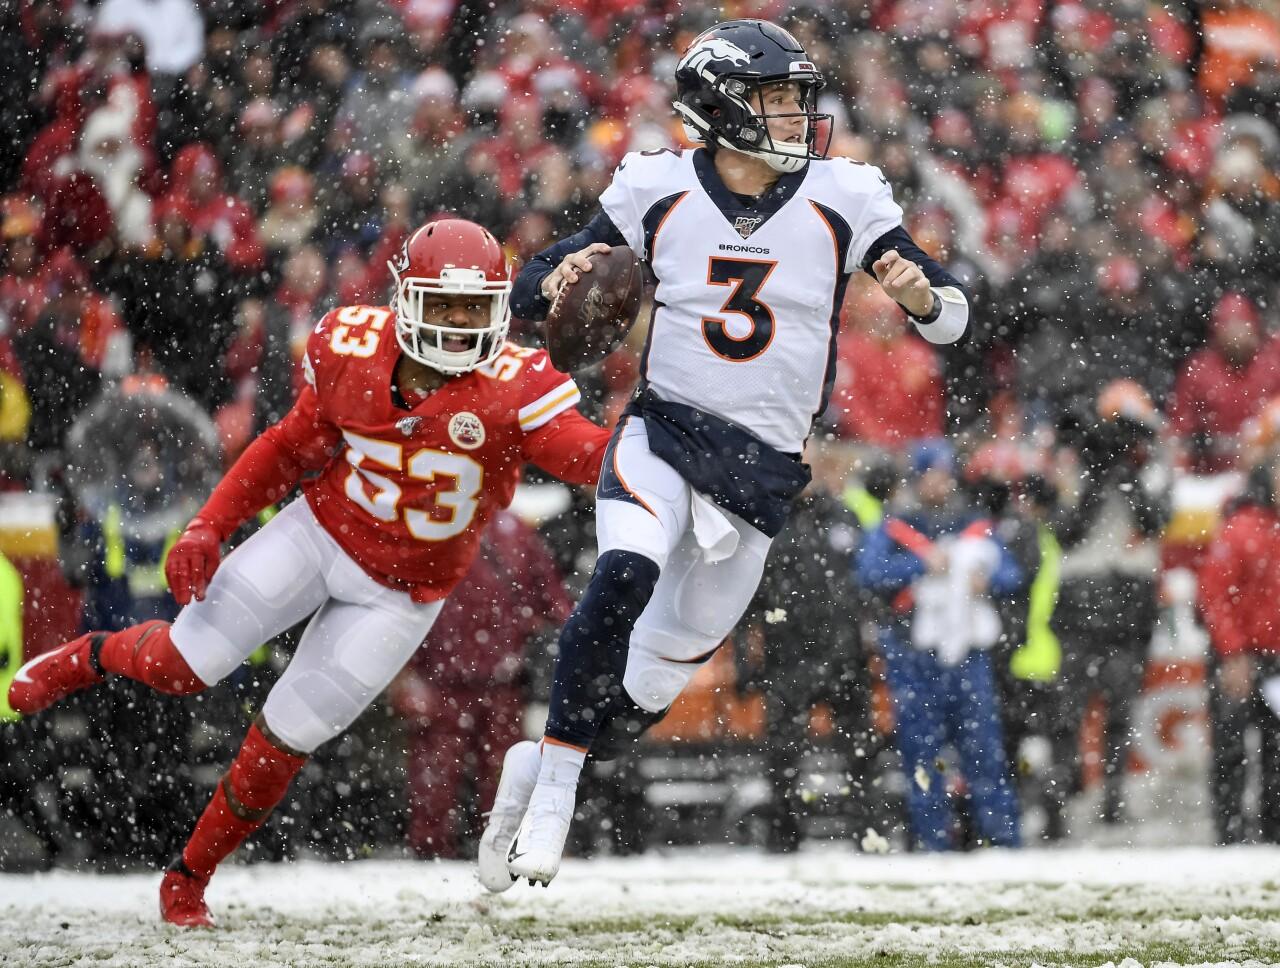 Denver Broncos QB Drew Lock vs Kansas City Chiefs in snow in 2019